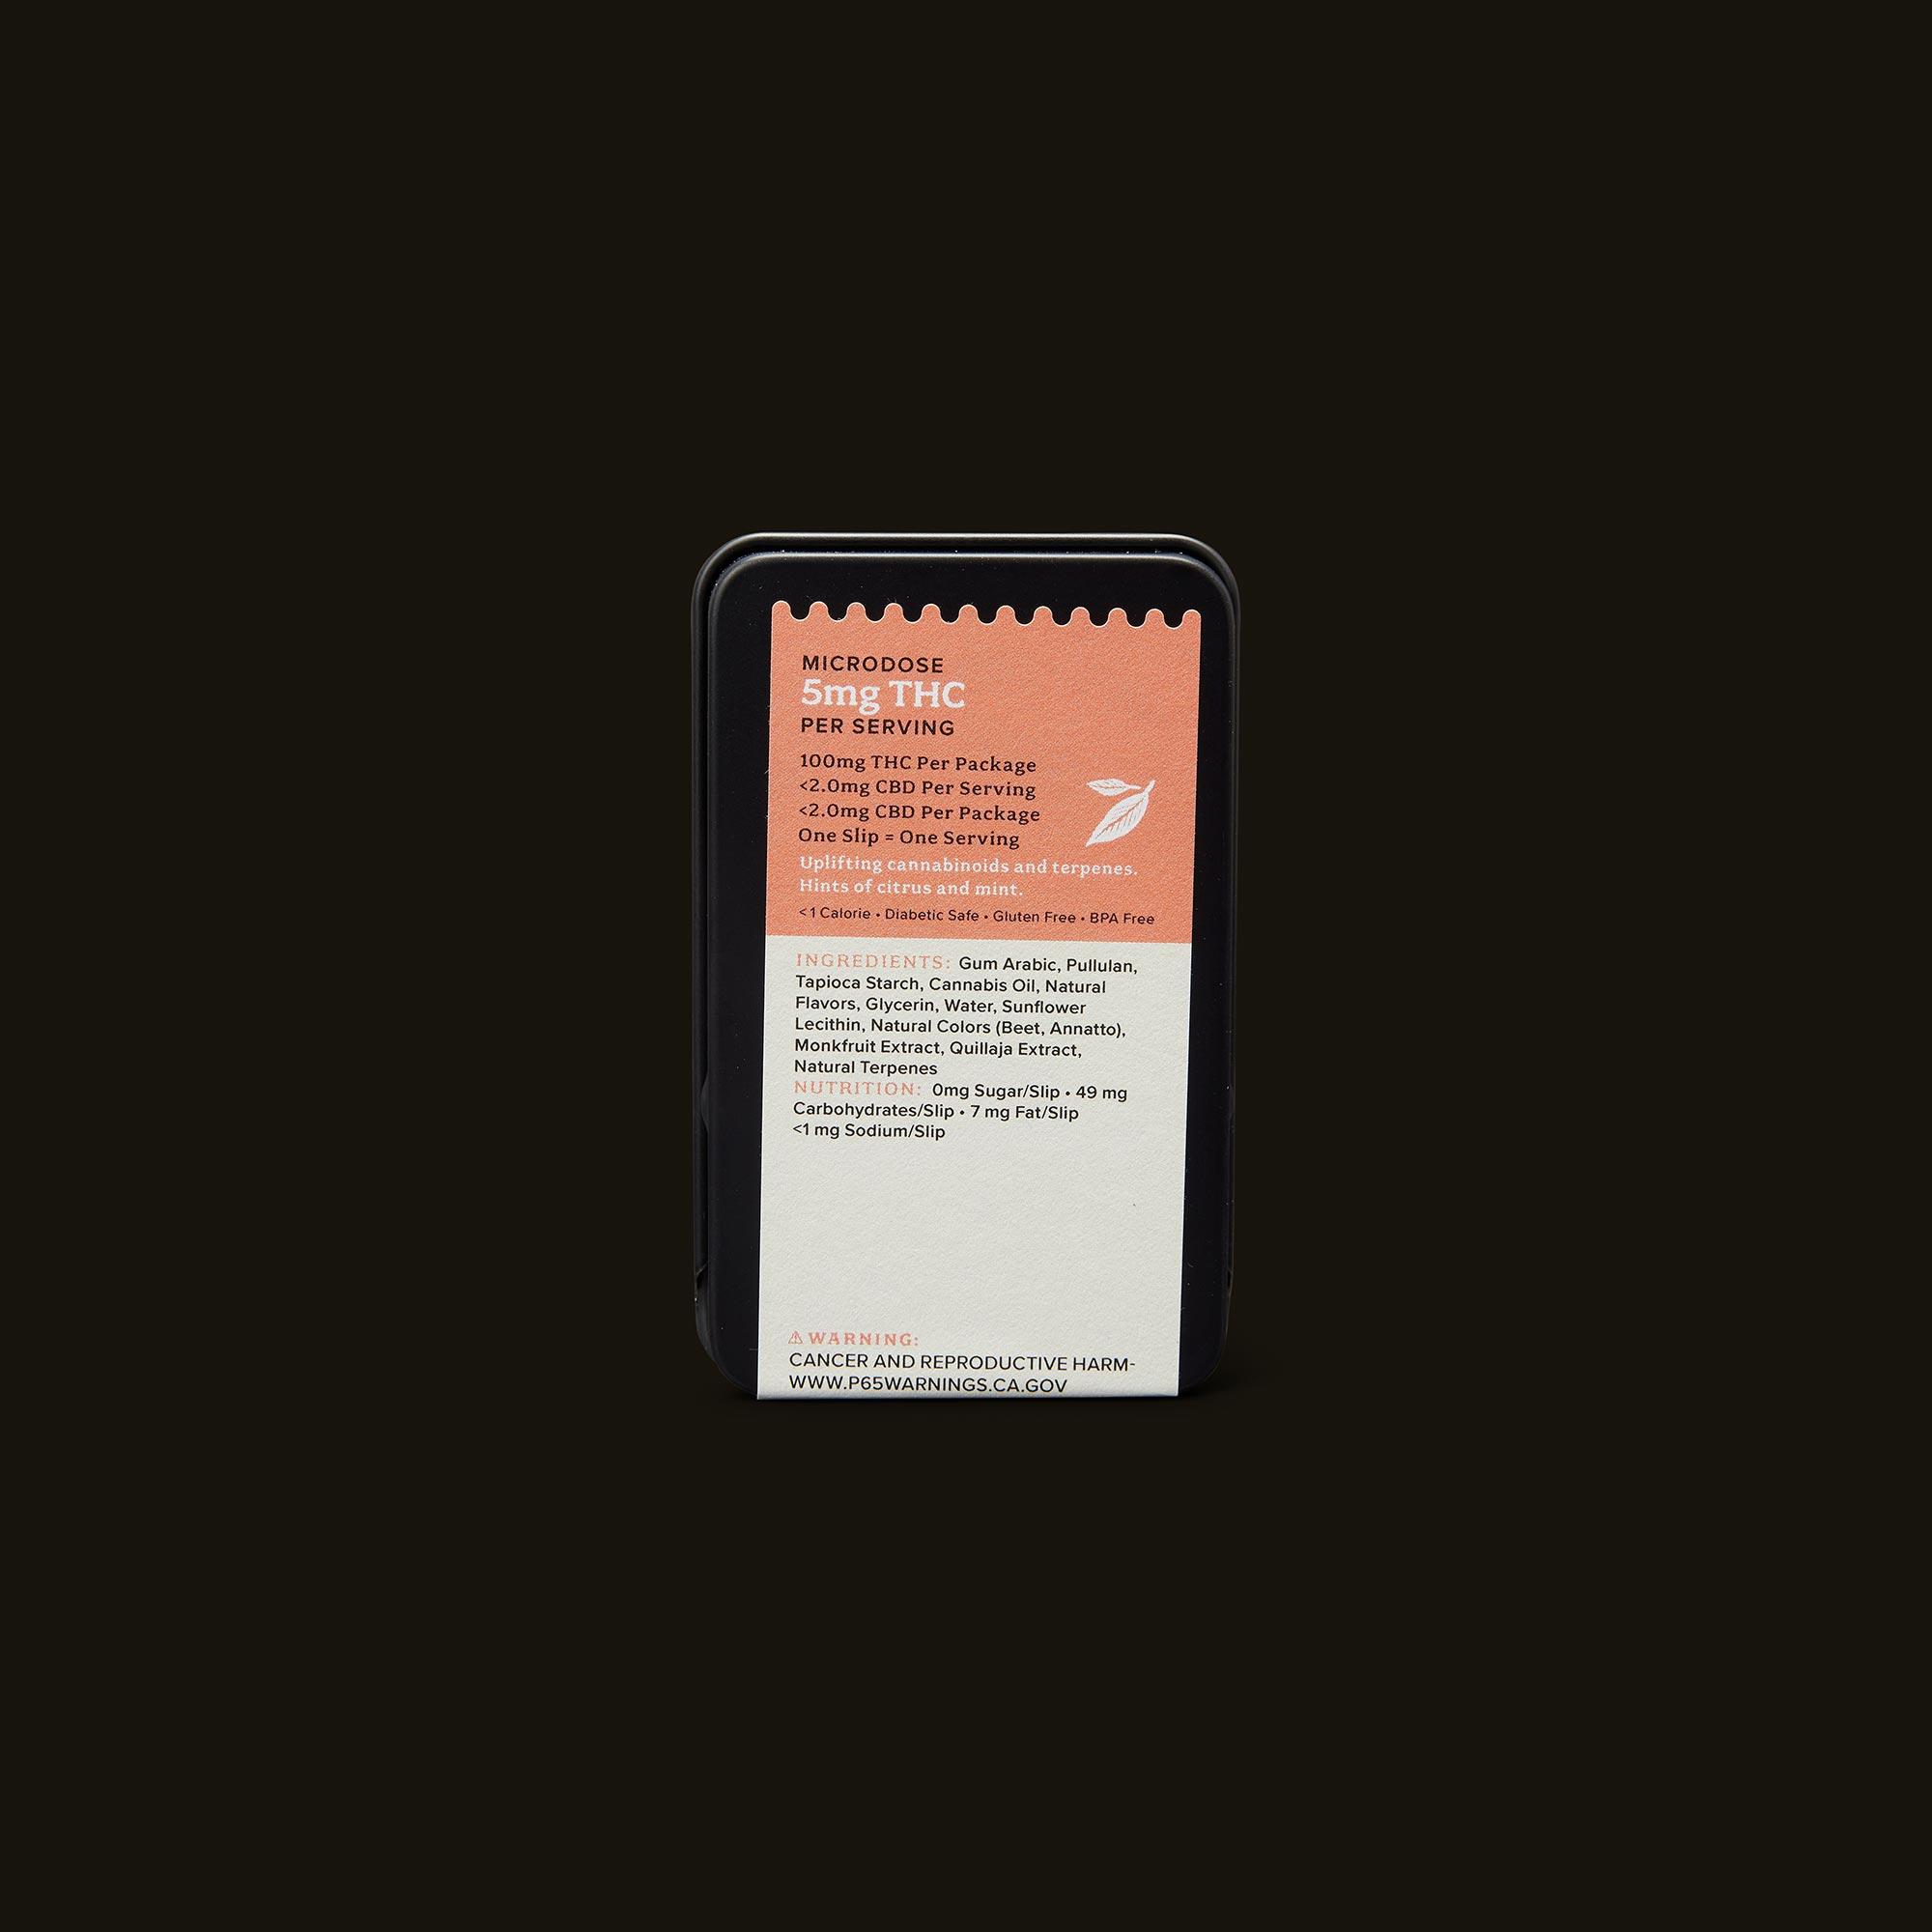 Kin Slips Cloud Buster Microdose Back Packaging